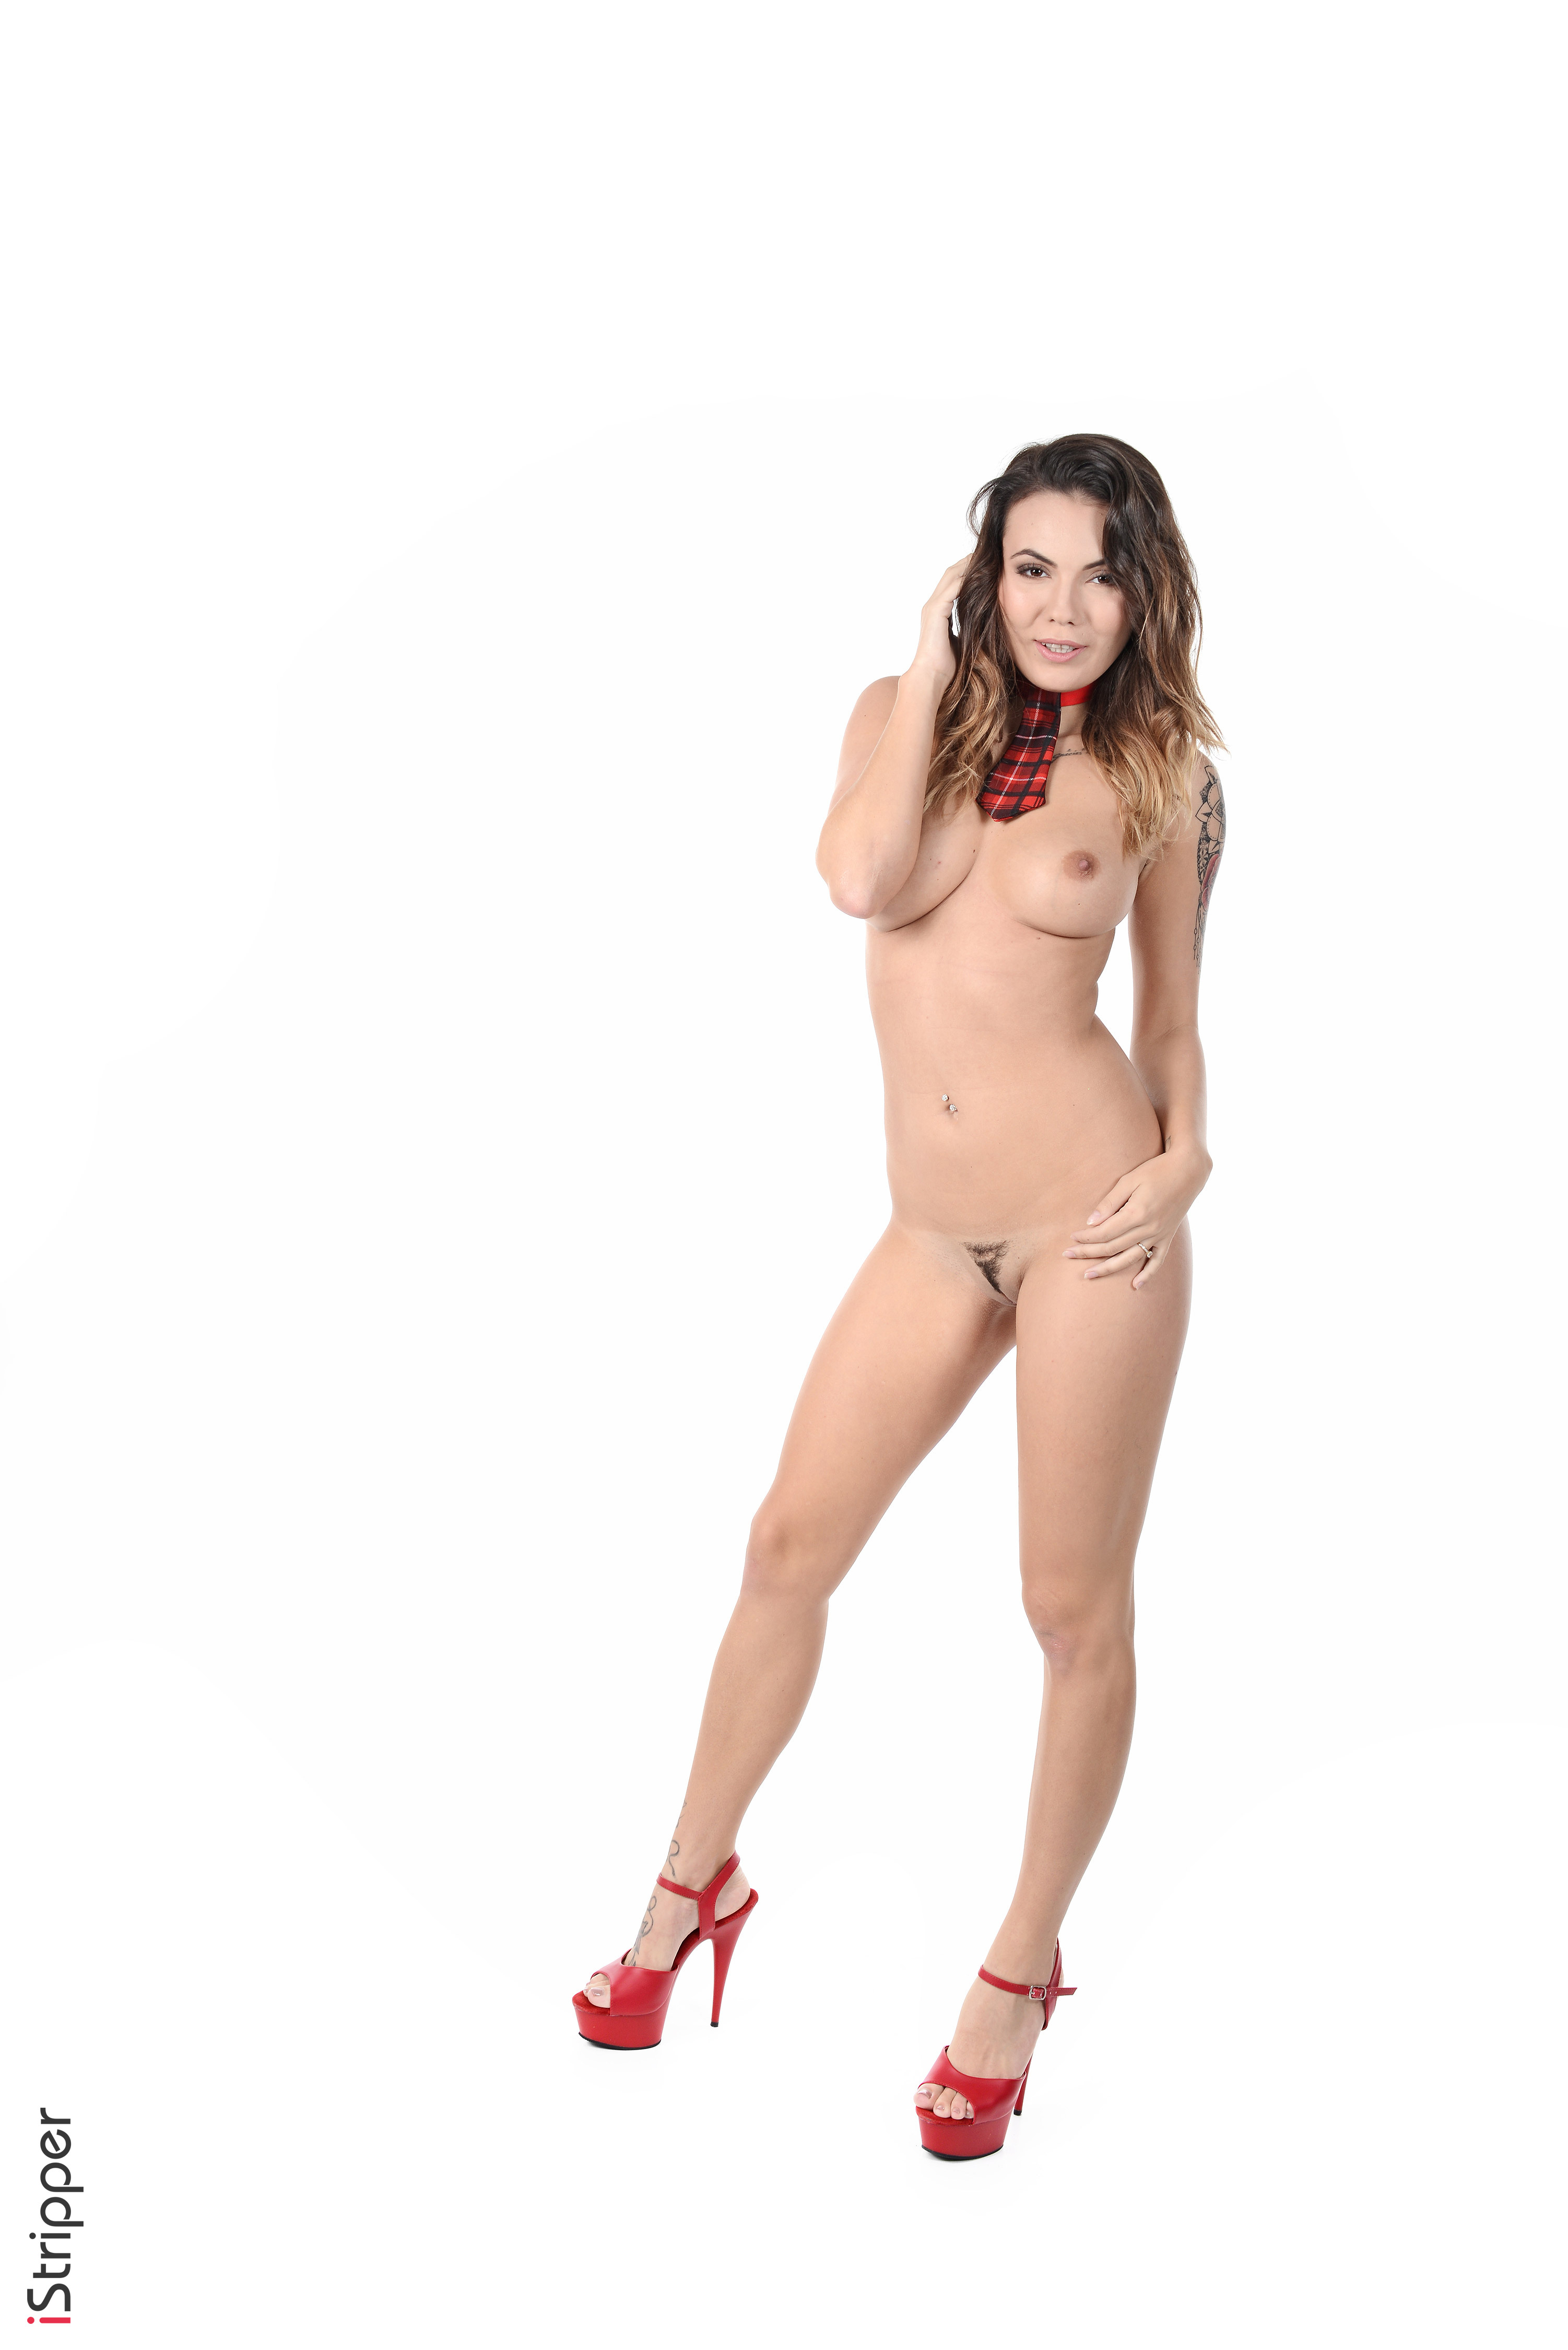 tumblr big tit girls amateur stripping videos